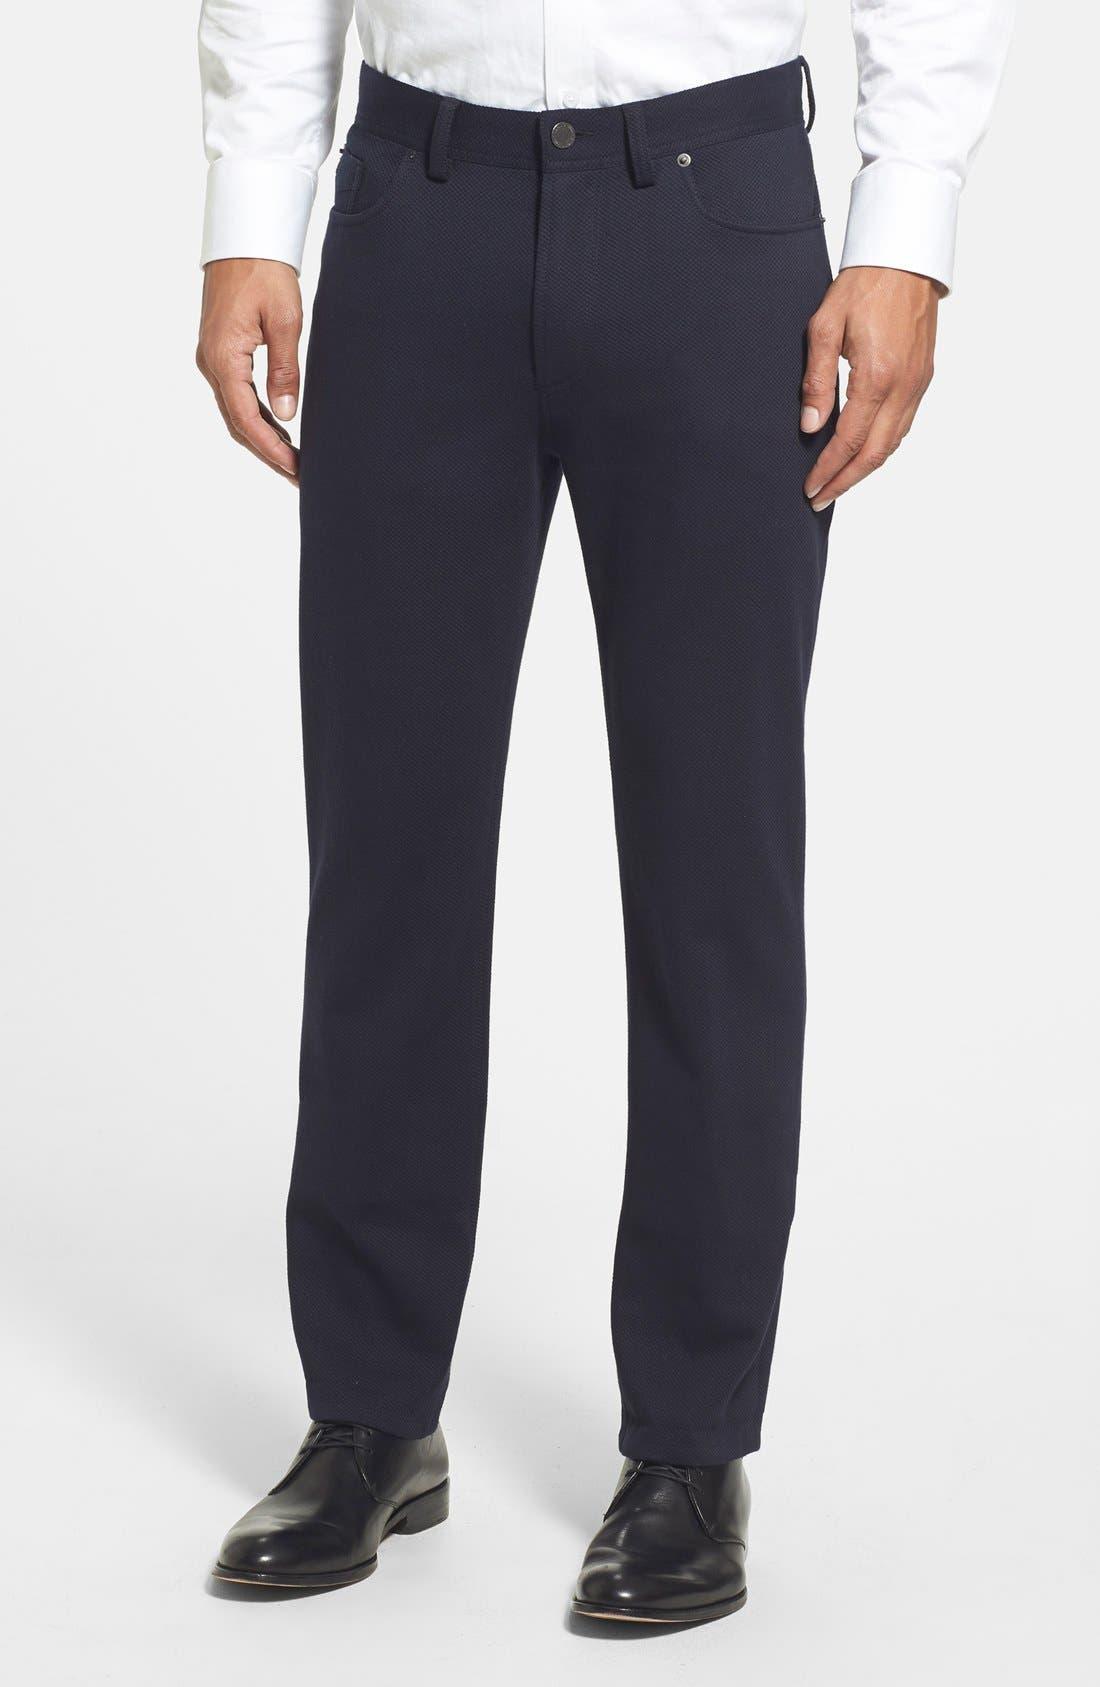 Vince Camuto Straight Leg Five Pocket Stretch Pants